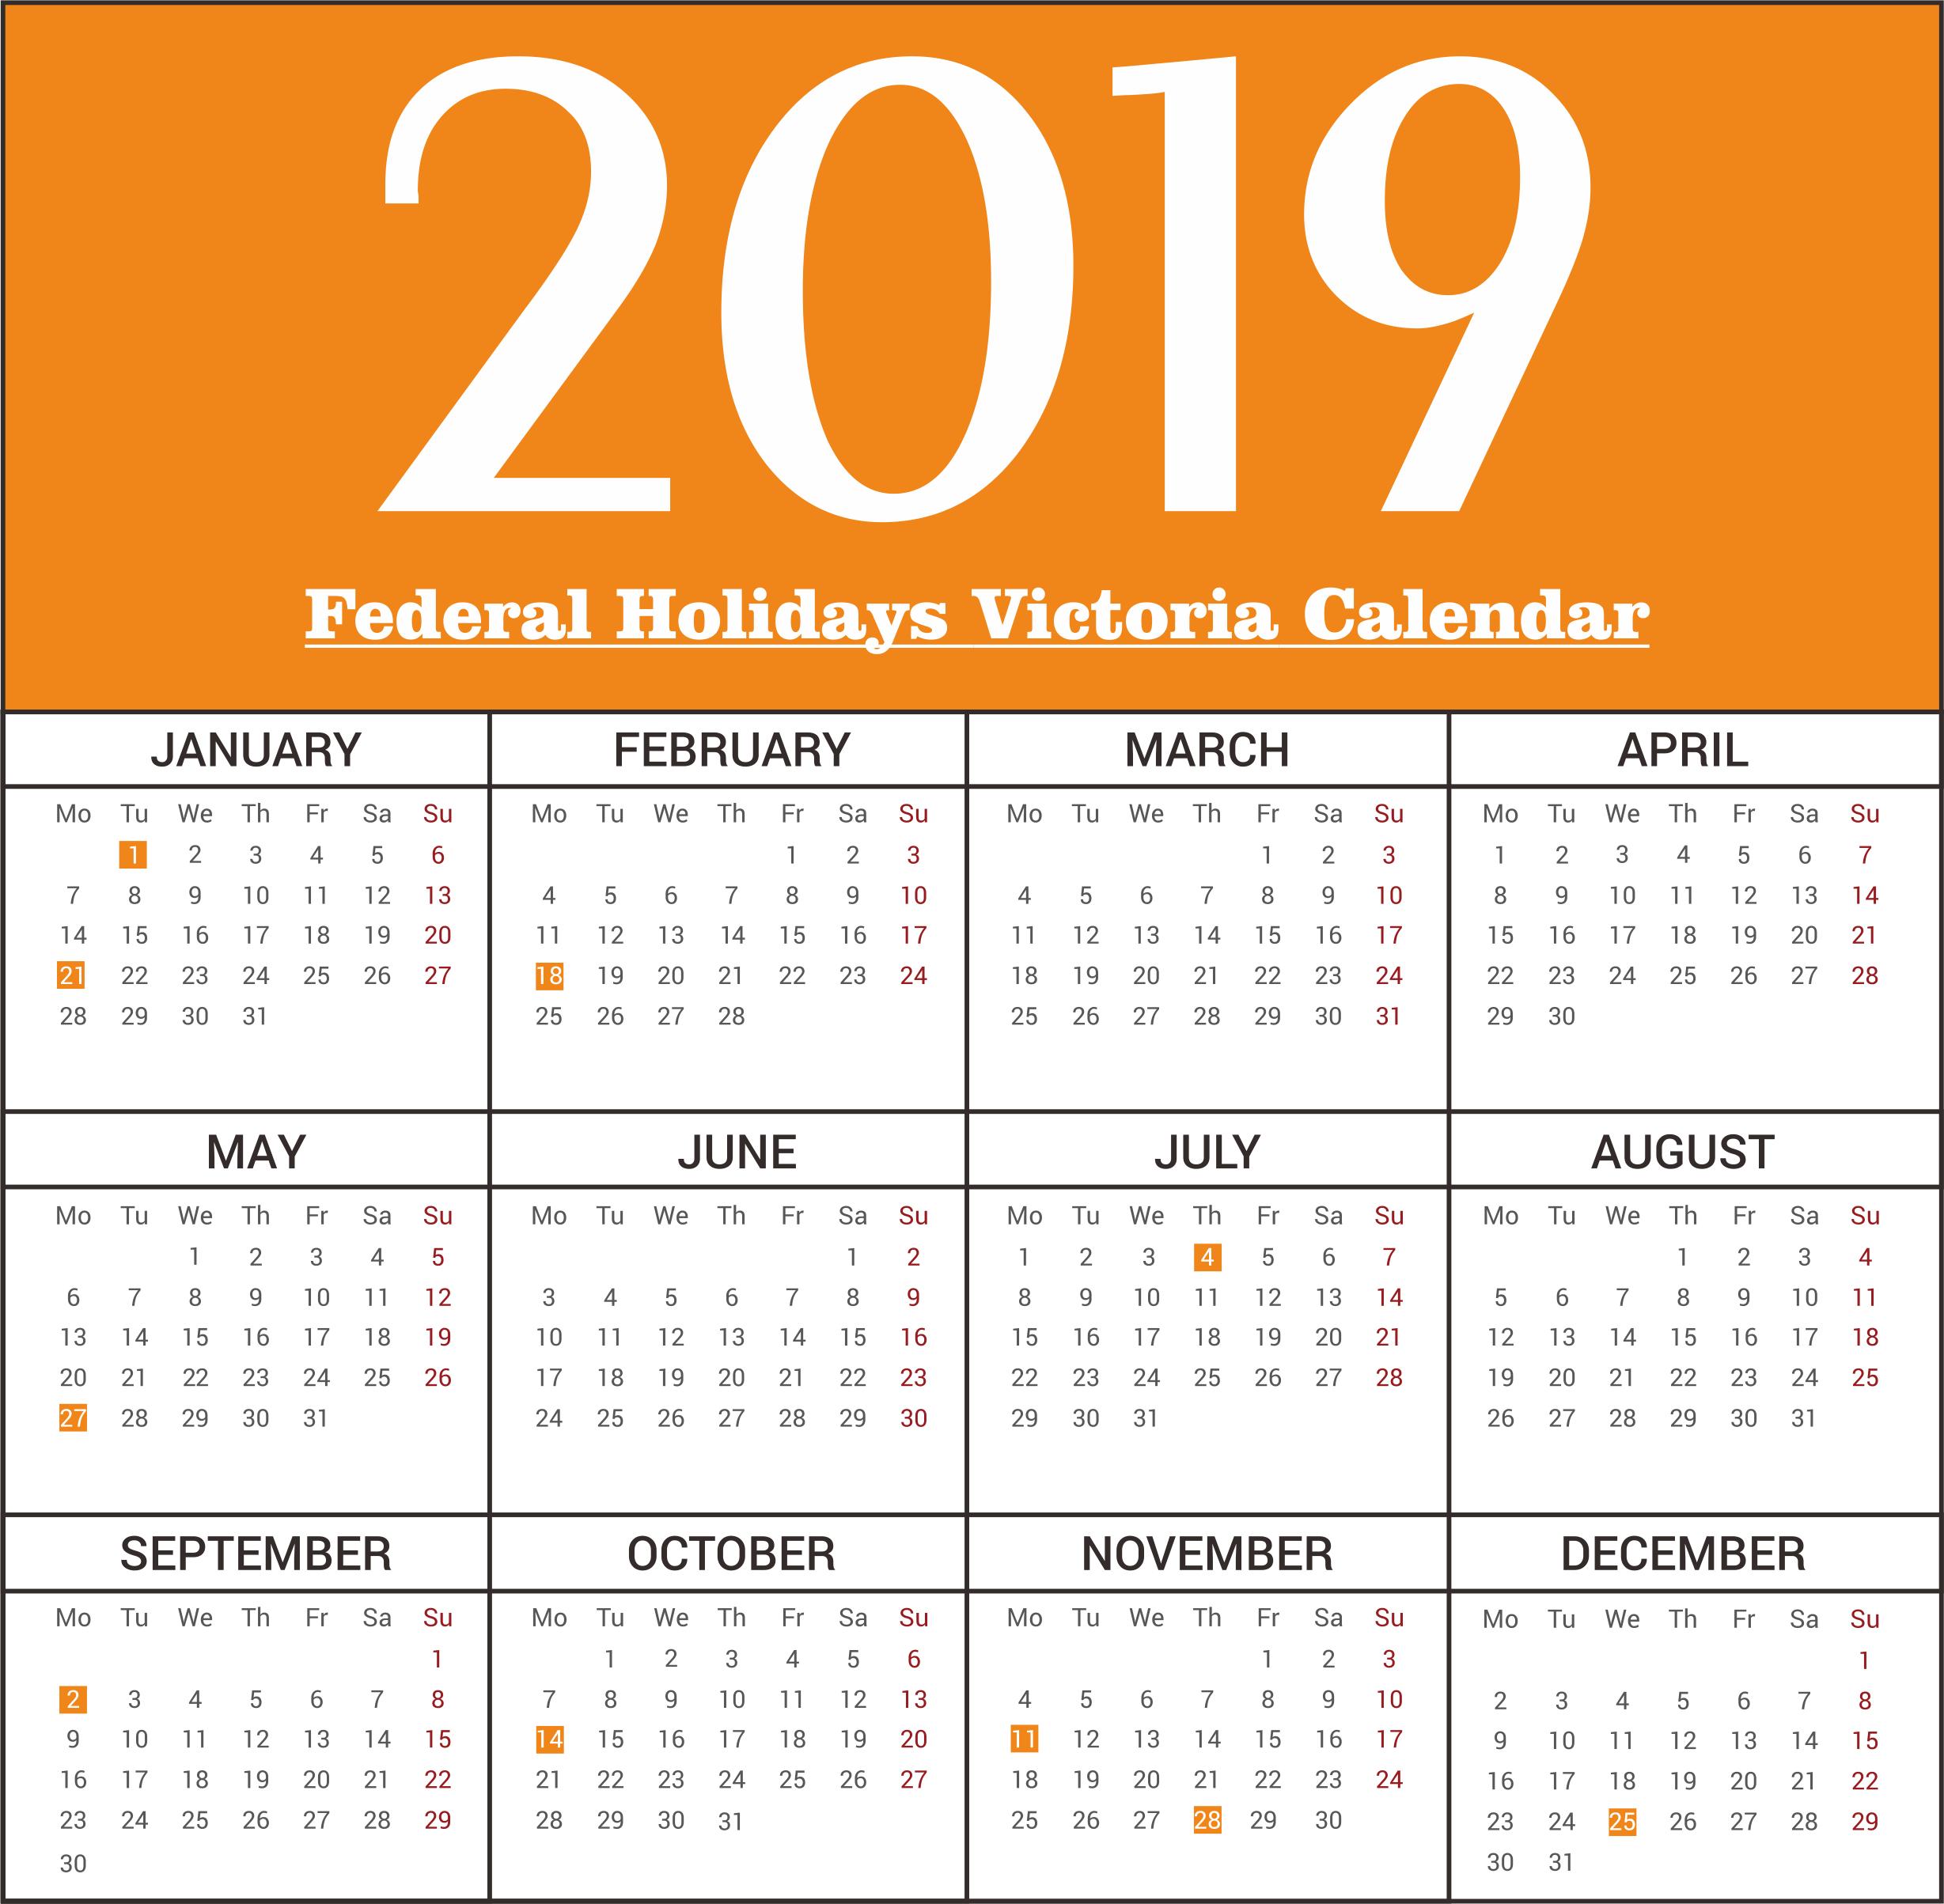 Free Victoria Federal Holidays 2019 Calendar Templates | Free Calendar 2019 Victoria